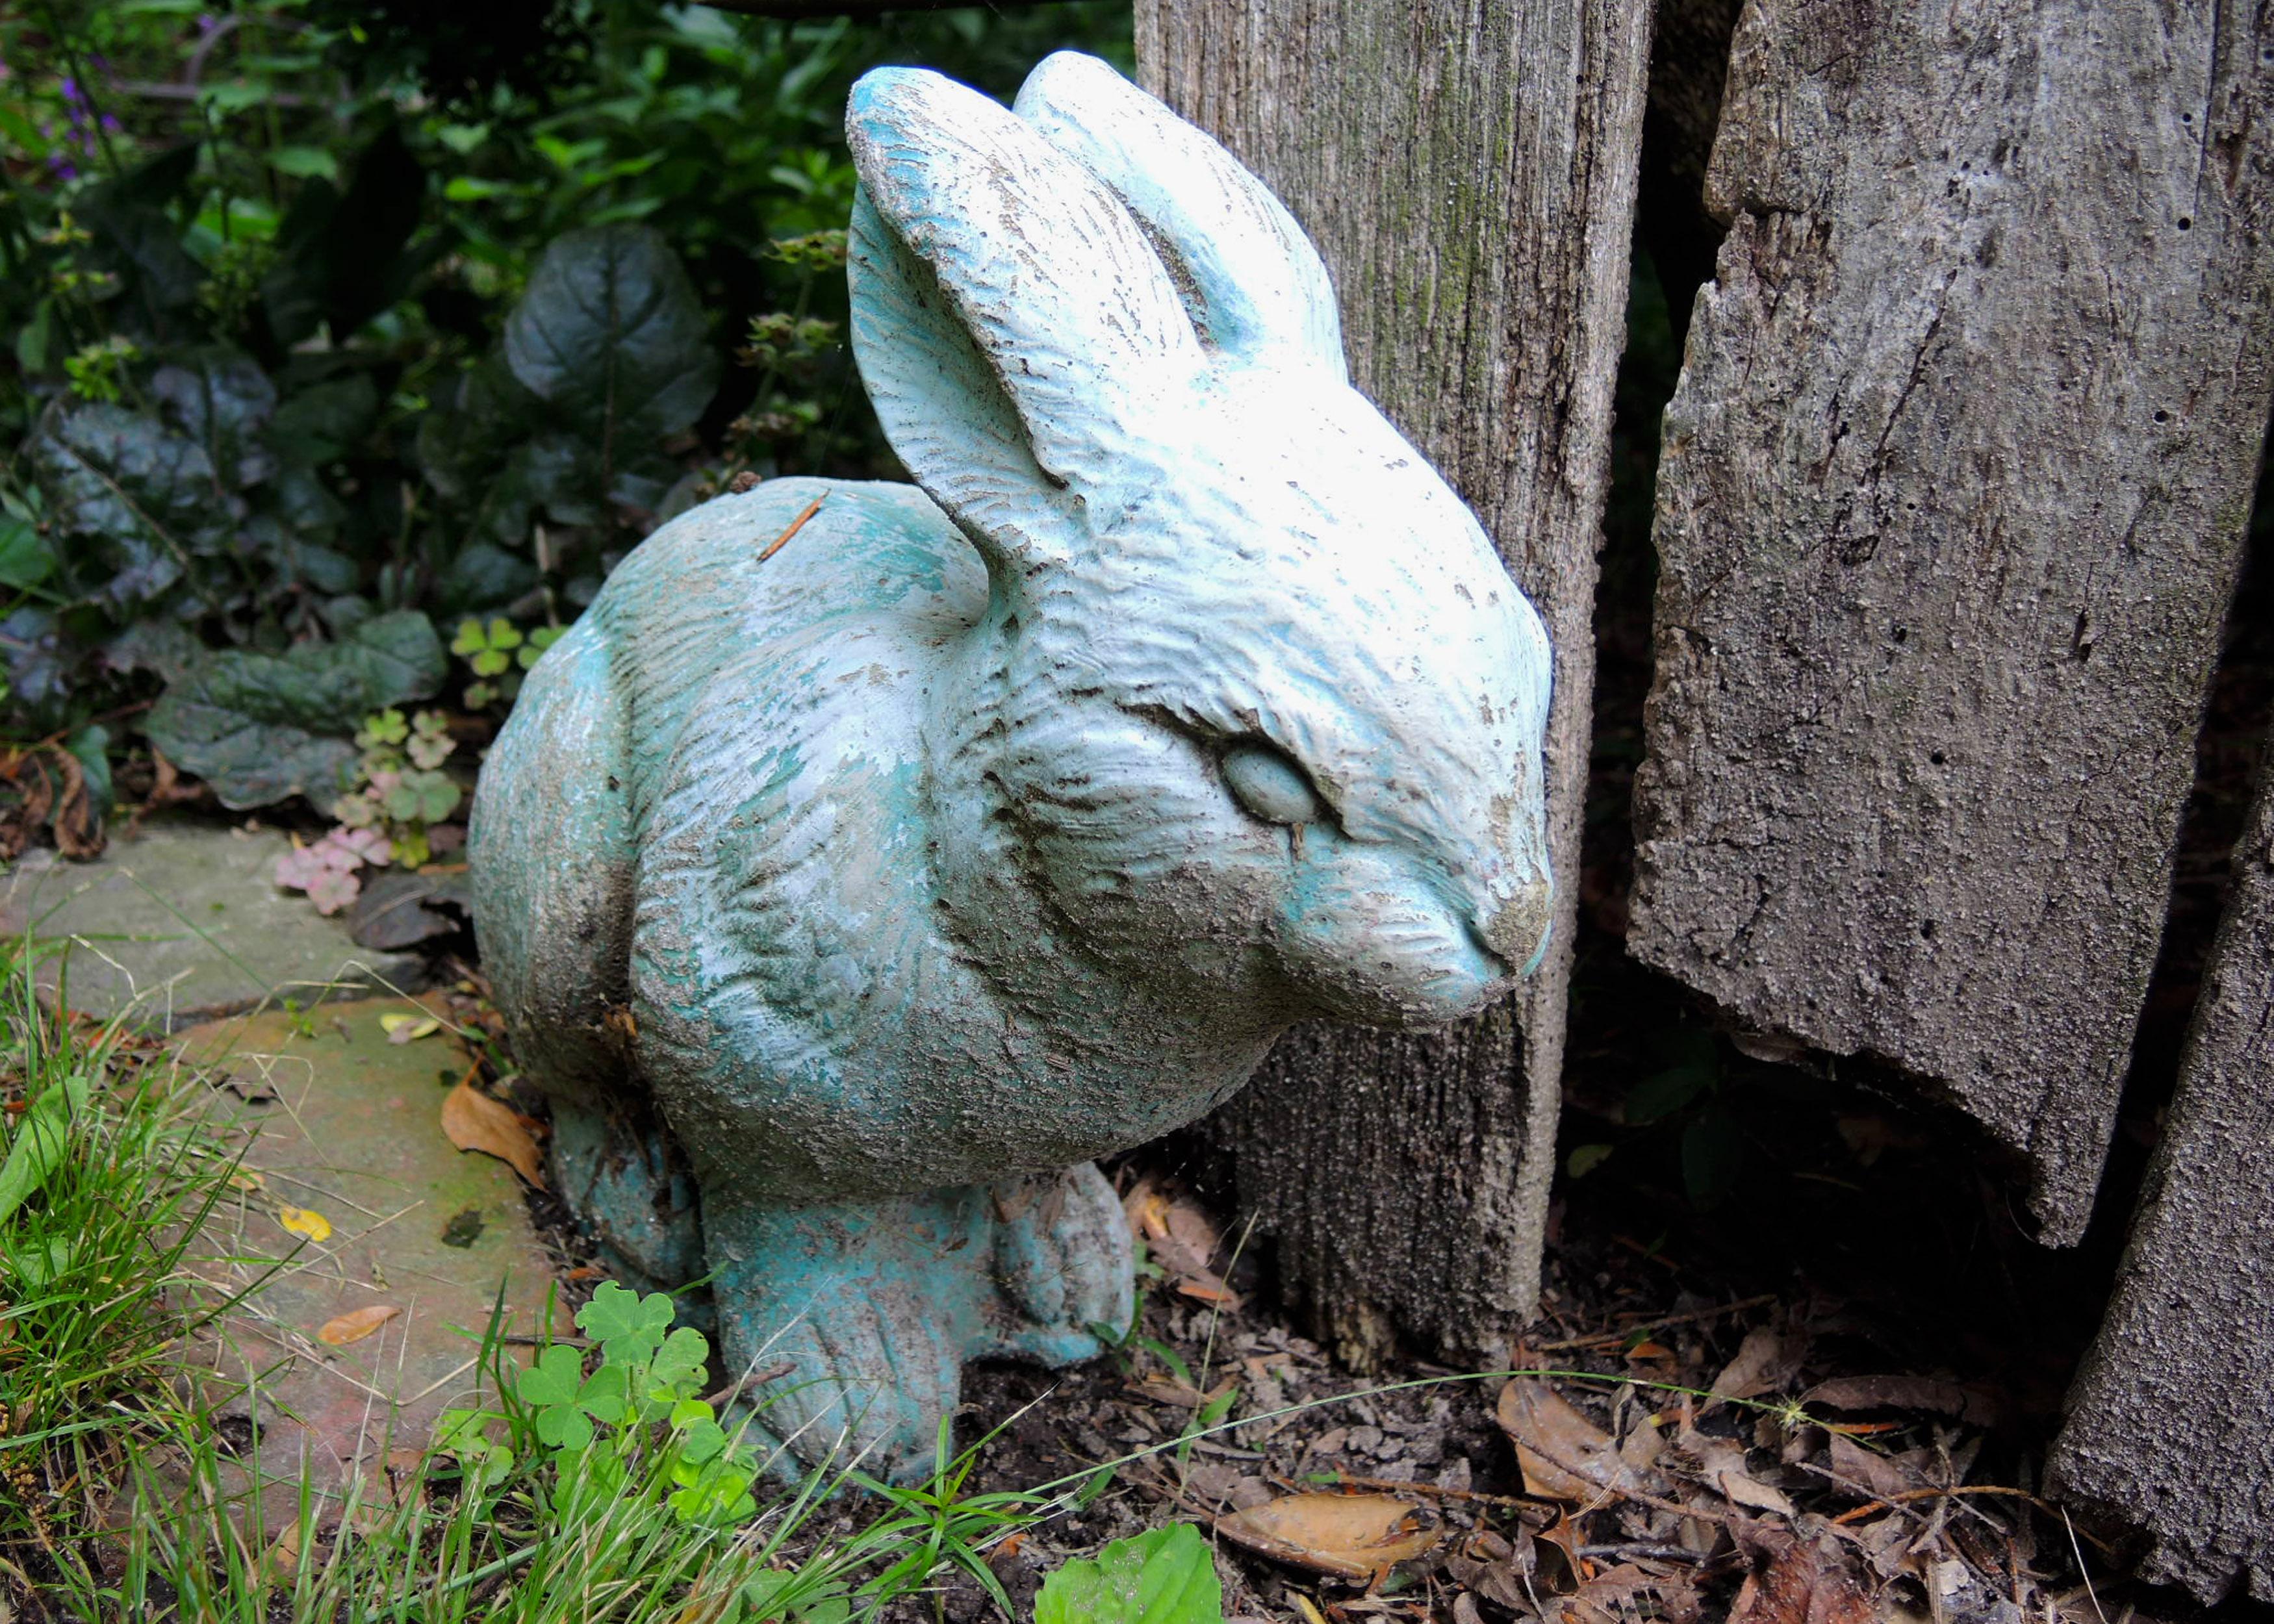 DSCN0049 - Dennis' bunny.jpg